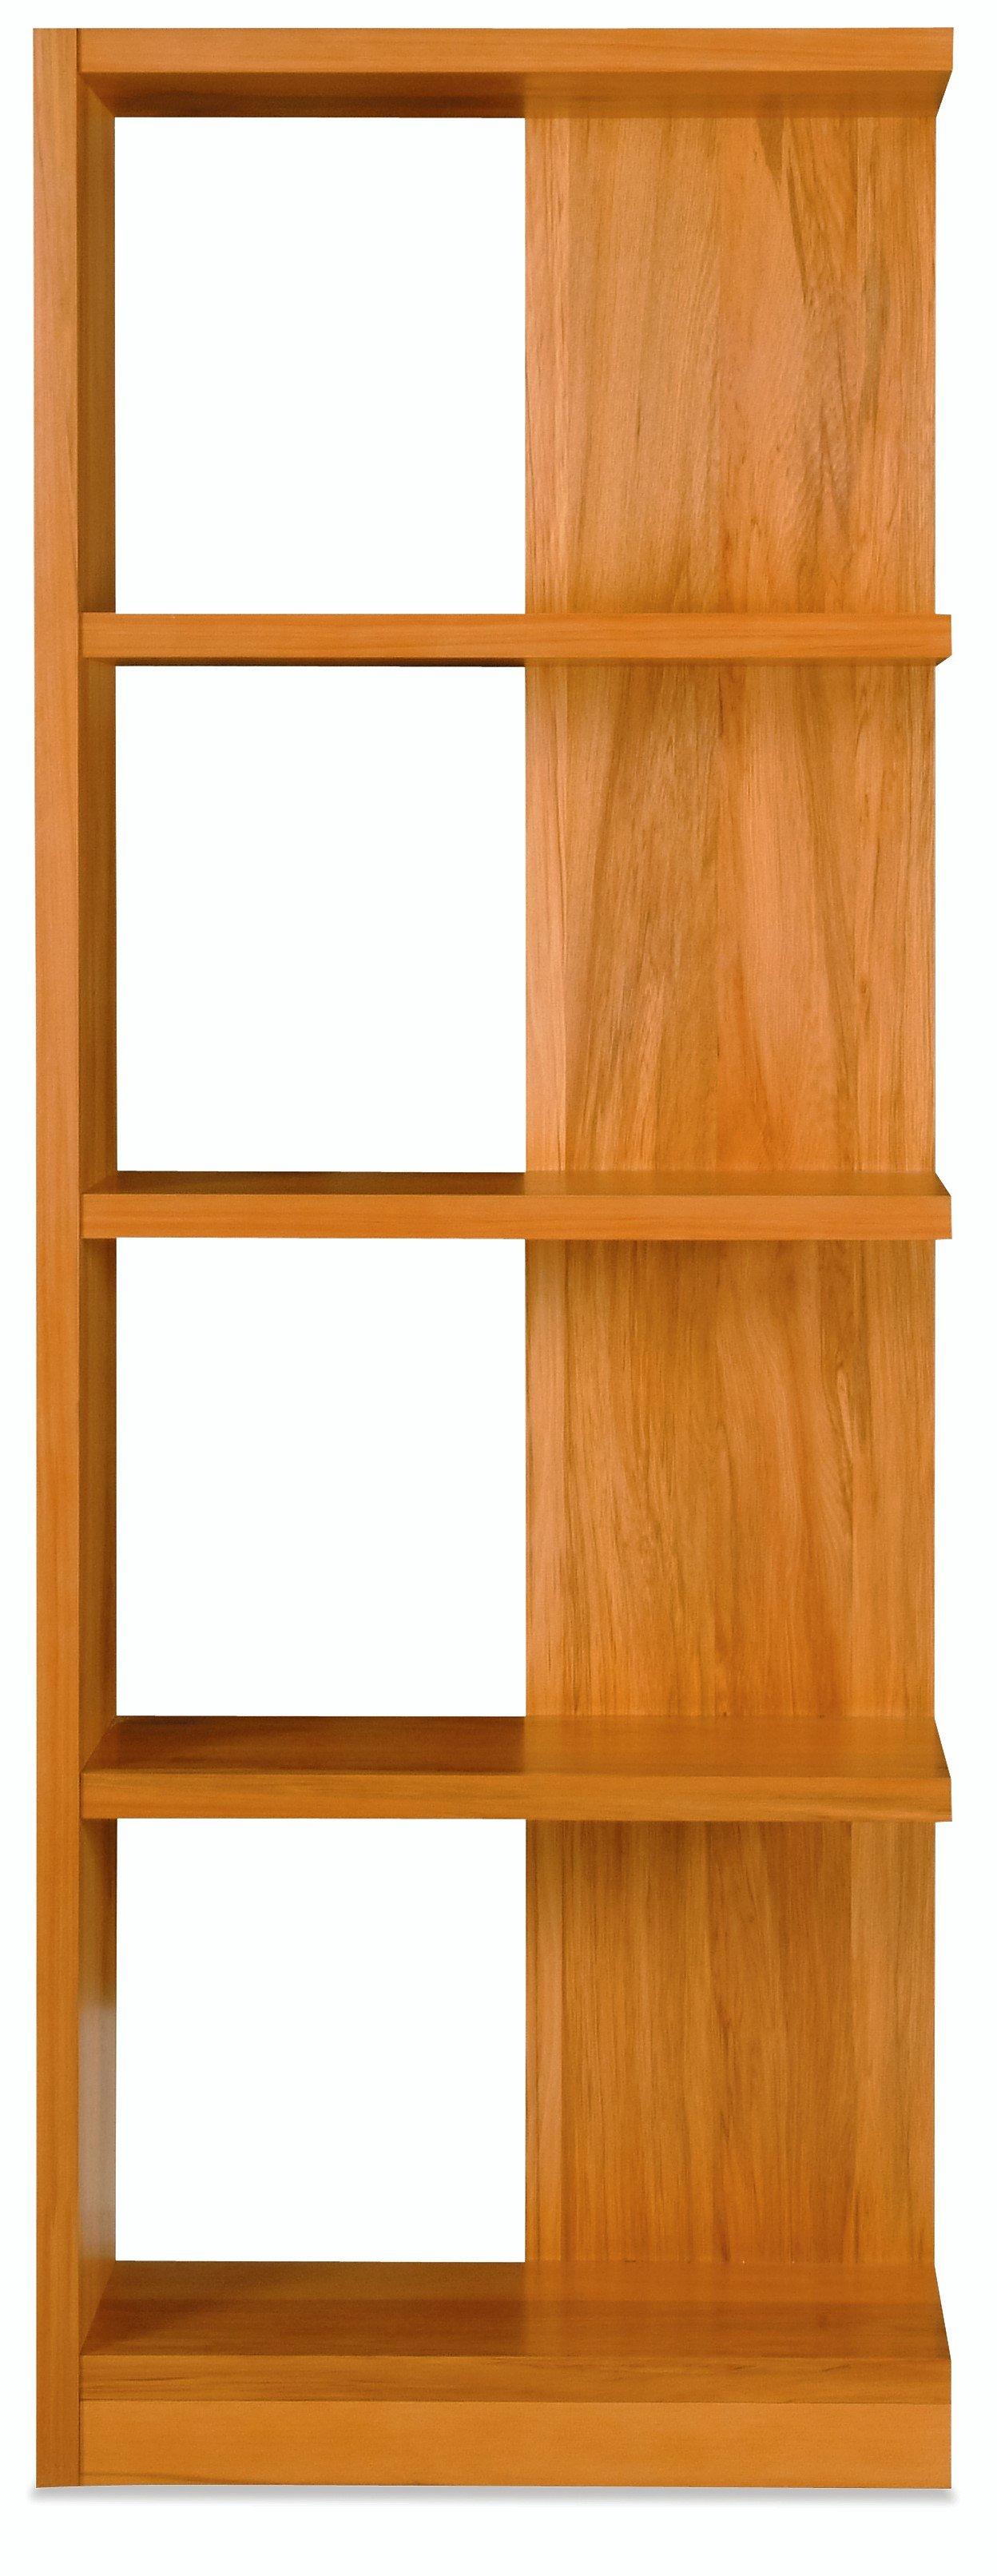 Custom Furniture | Christchurch, NZ | McDonald and Hartshorne Ltd